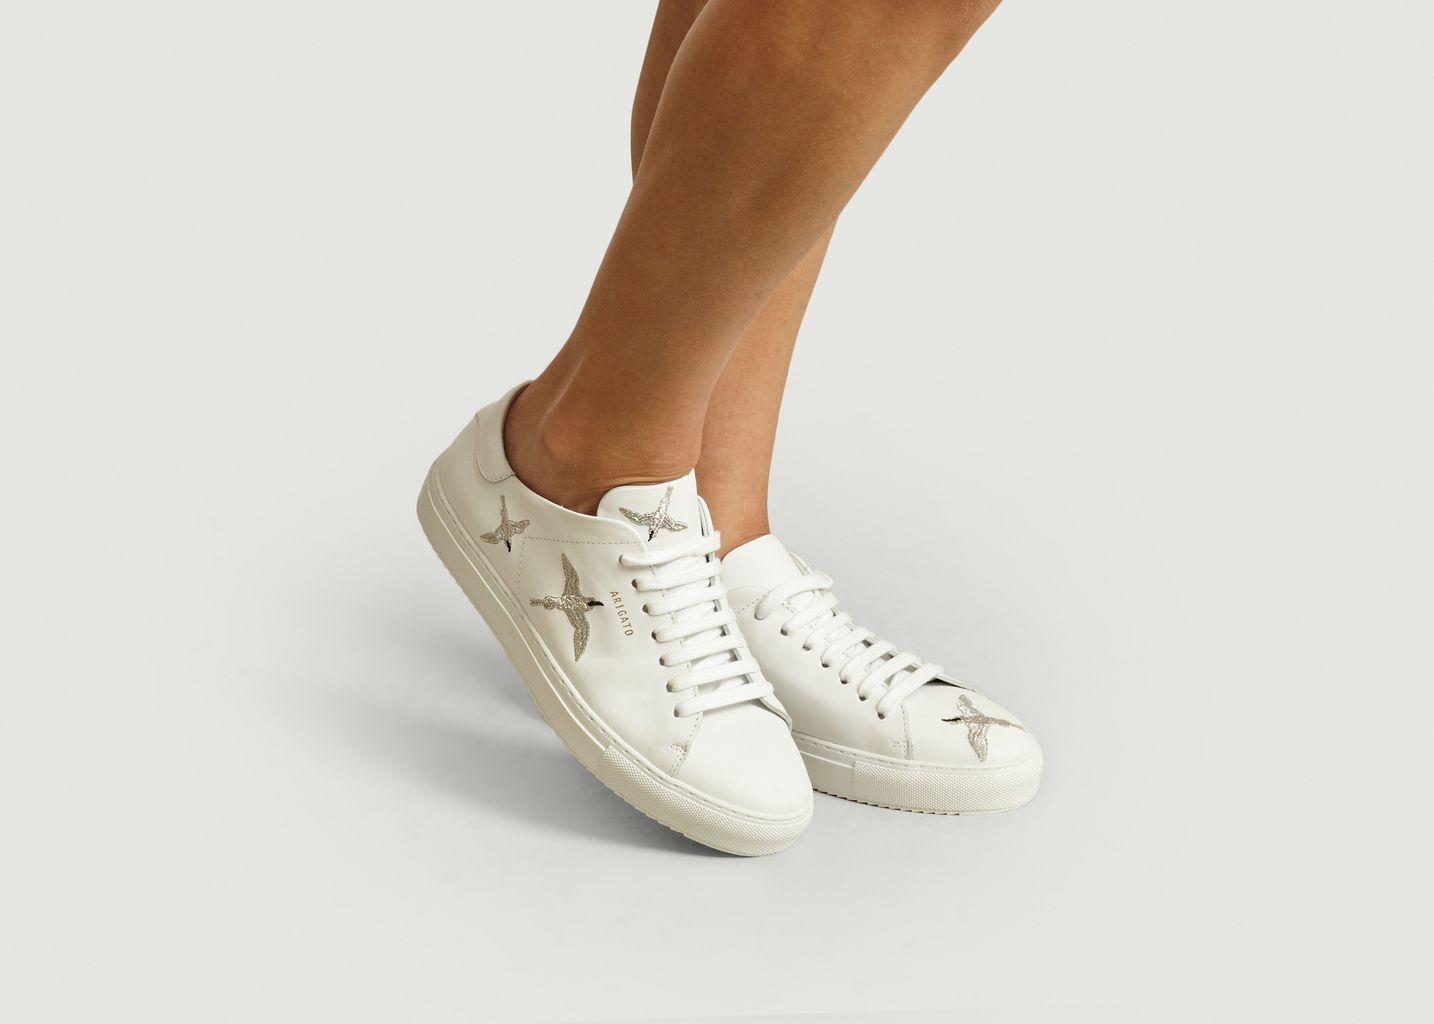 Sneakers En Cuir Clean 90 Avec Oiseaux Brodés - Axel Arigato